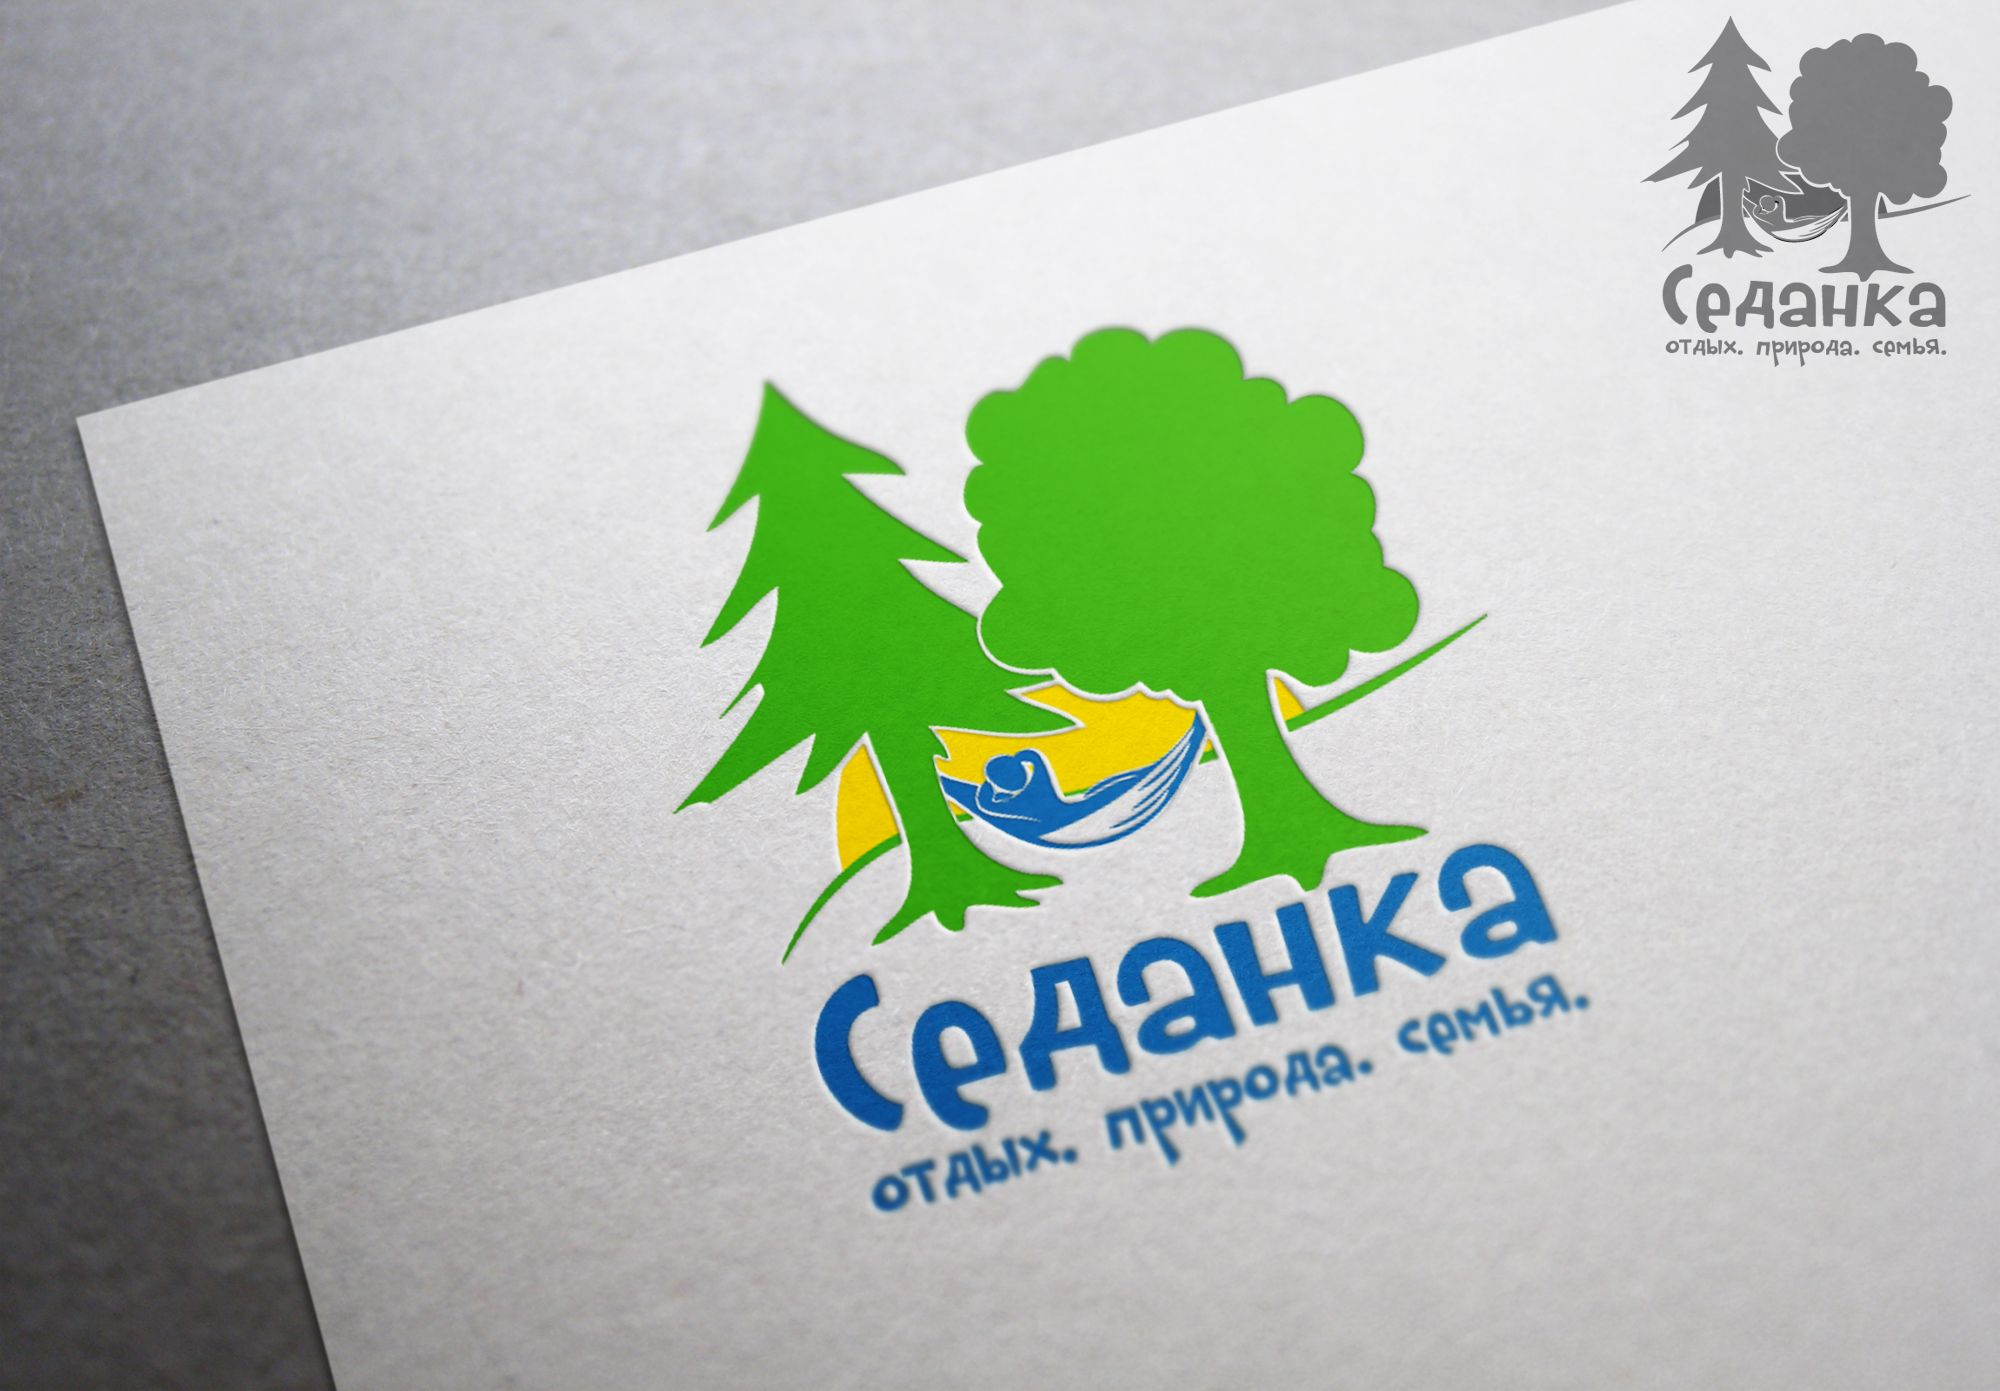 Логотип для центра отдыха - дизайнер spbreklama-ru